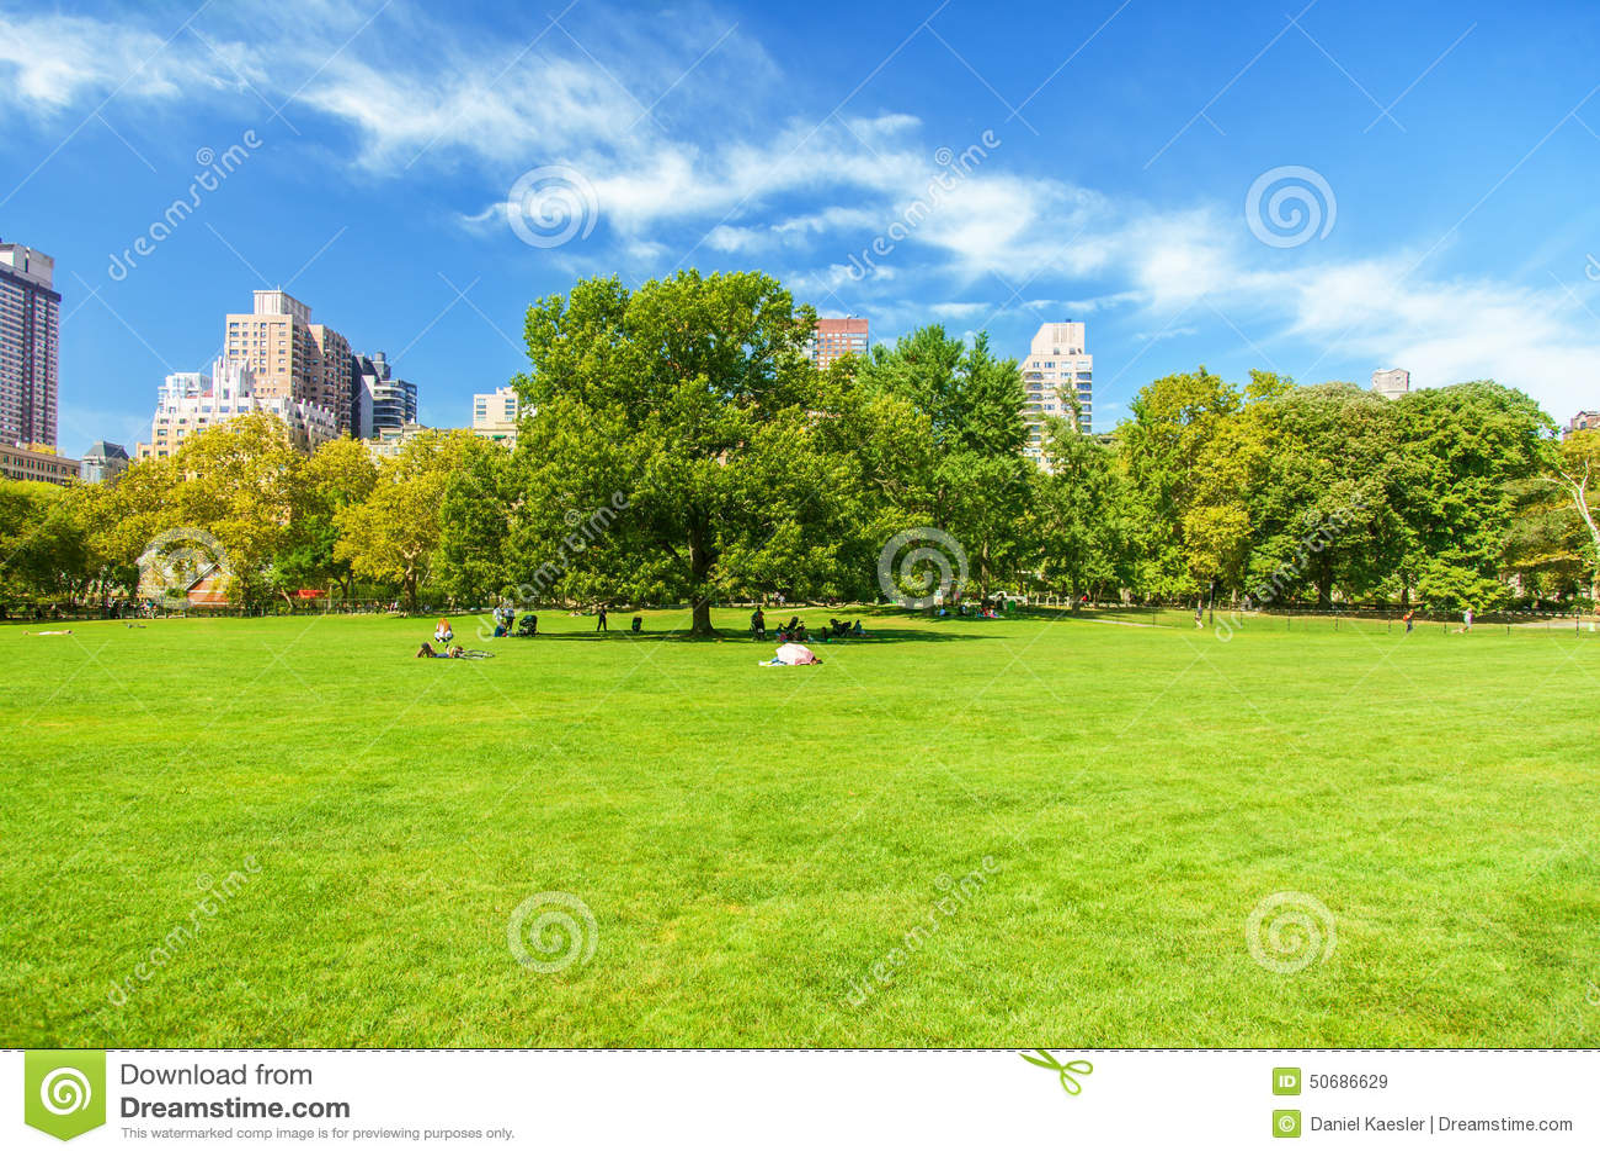 Download 中央公园 库存图片. 图片 包括有 中央, 草甸, 目的地, 城市, 公园, 曼哈顿, 田园诗, 风景, 亚马逊 - 50686629